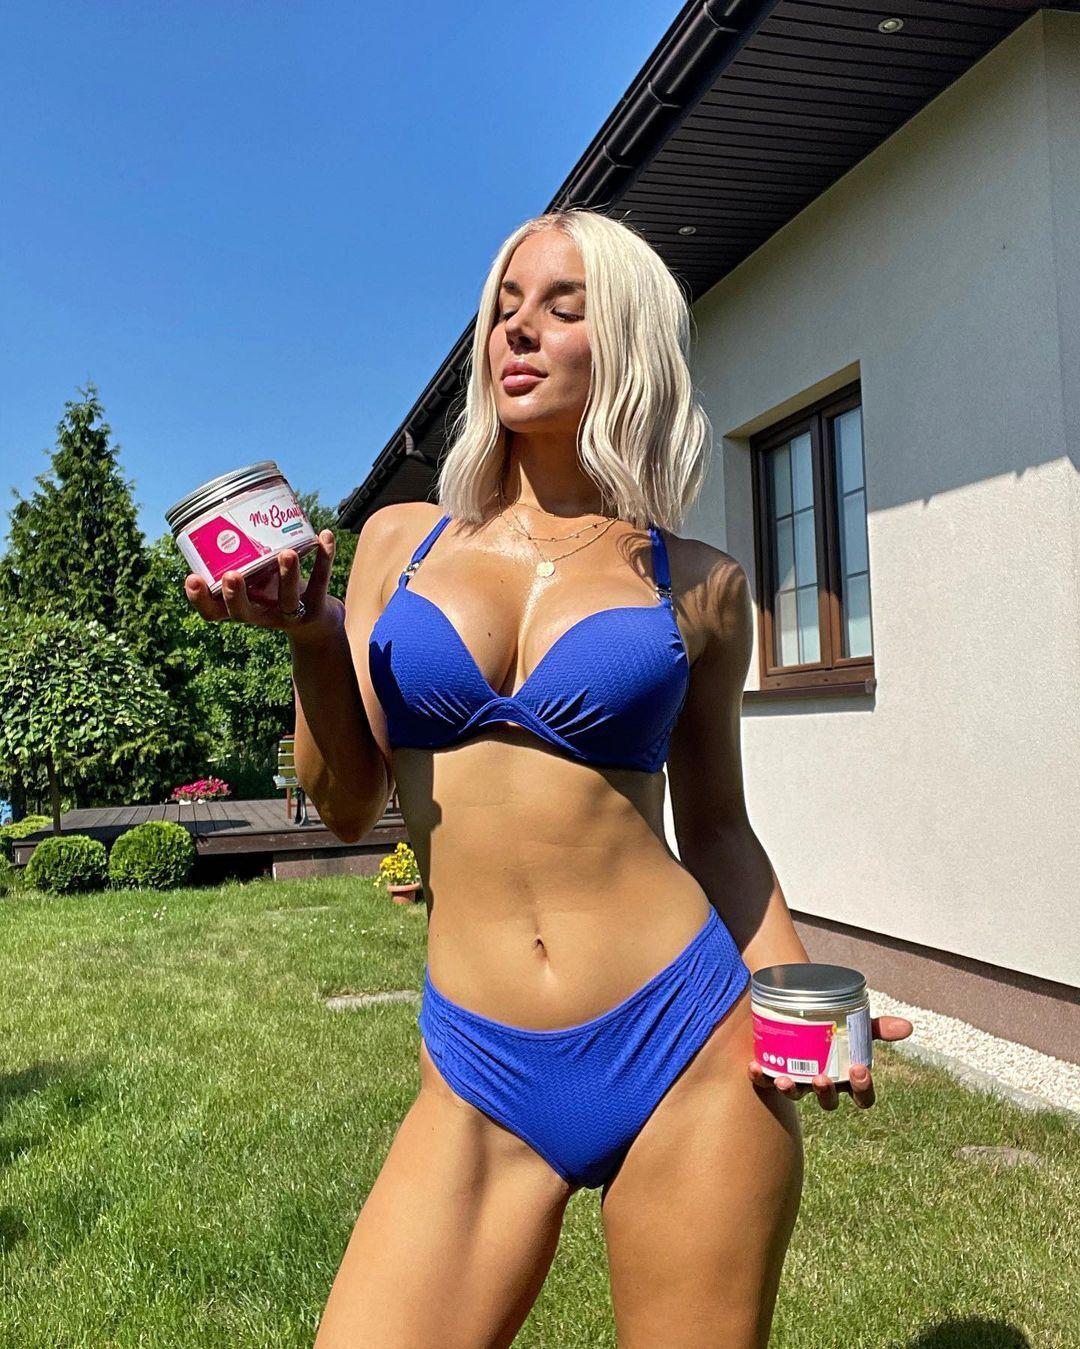 Аньела Богуш у синьому купальнику